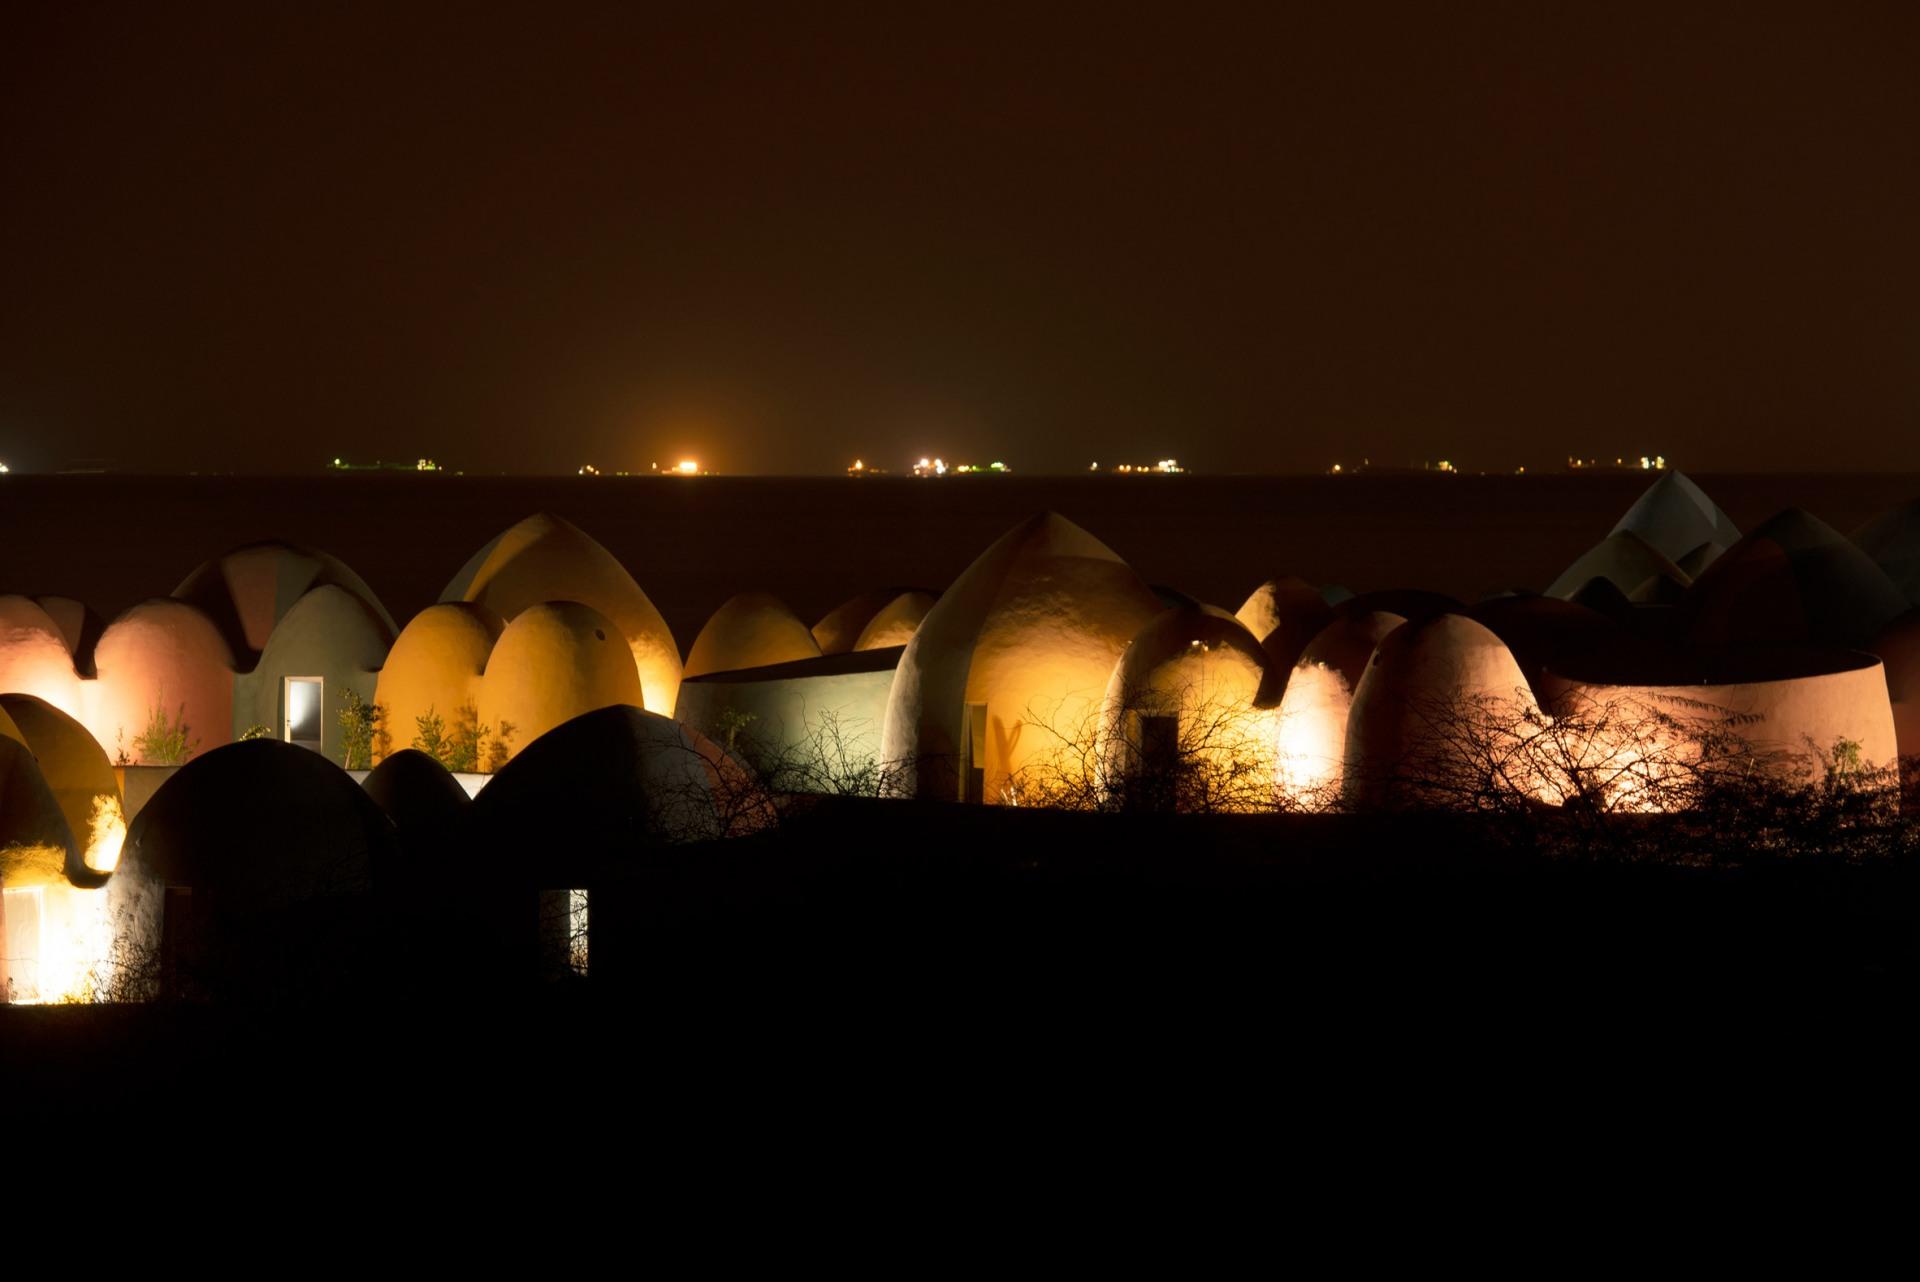 zav_architects_iran_hormuz_island_designalive-9